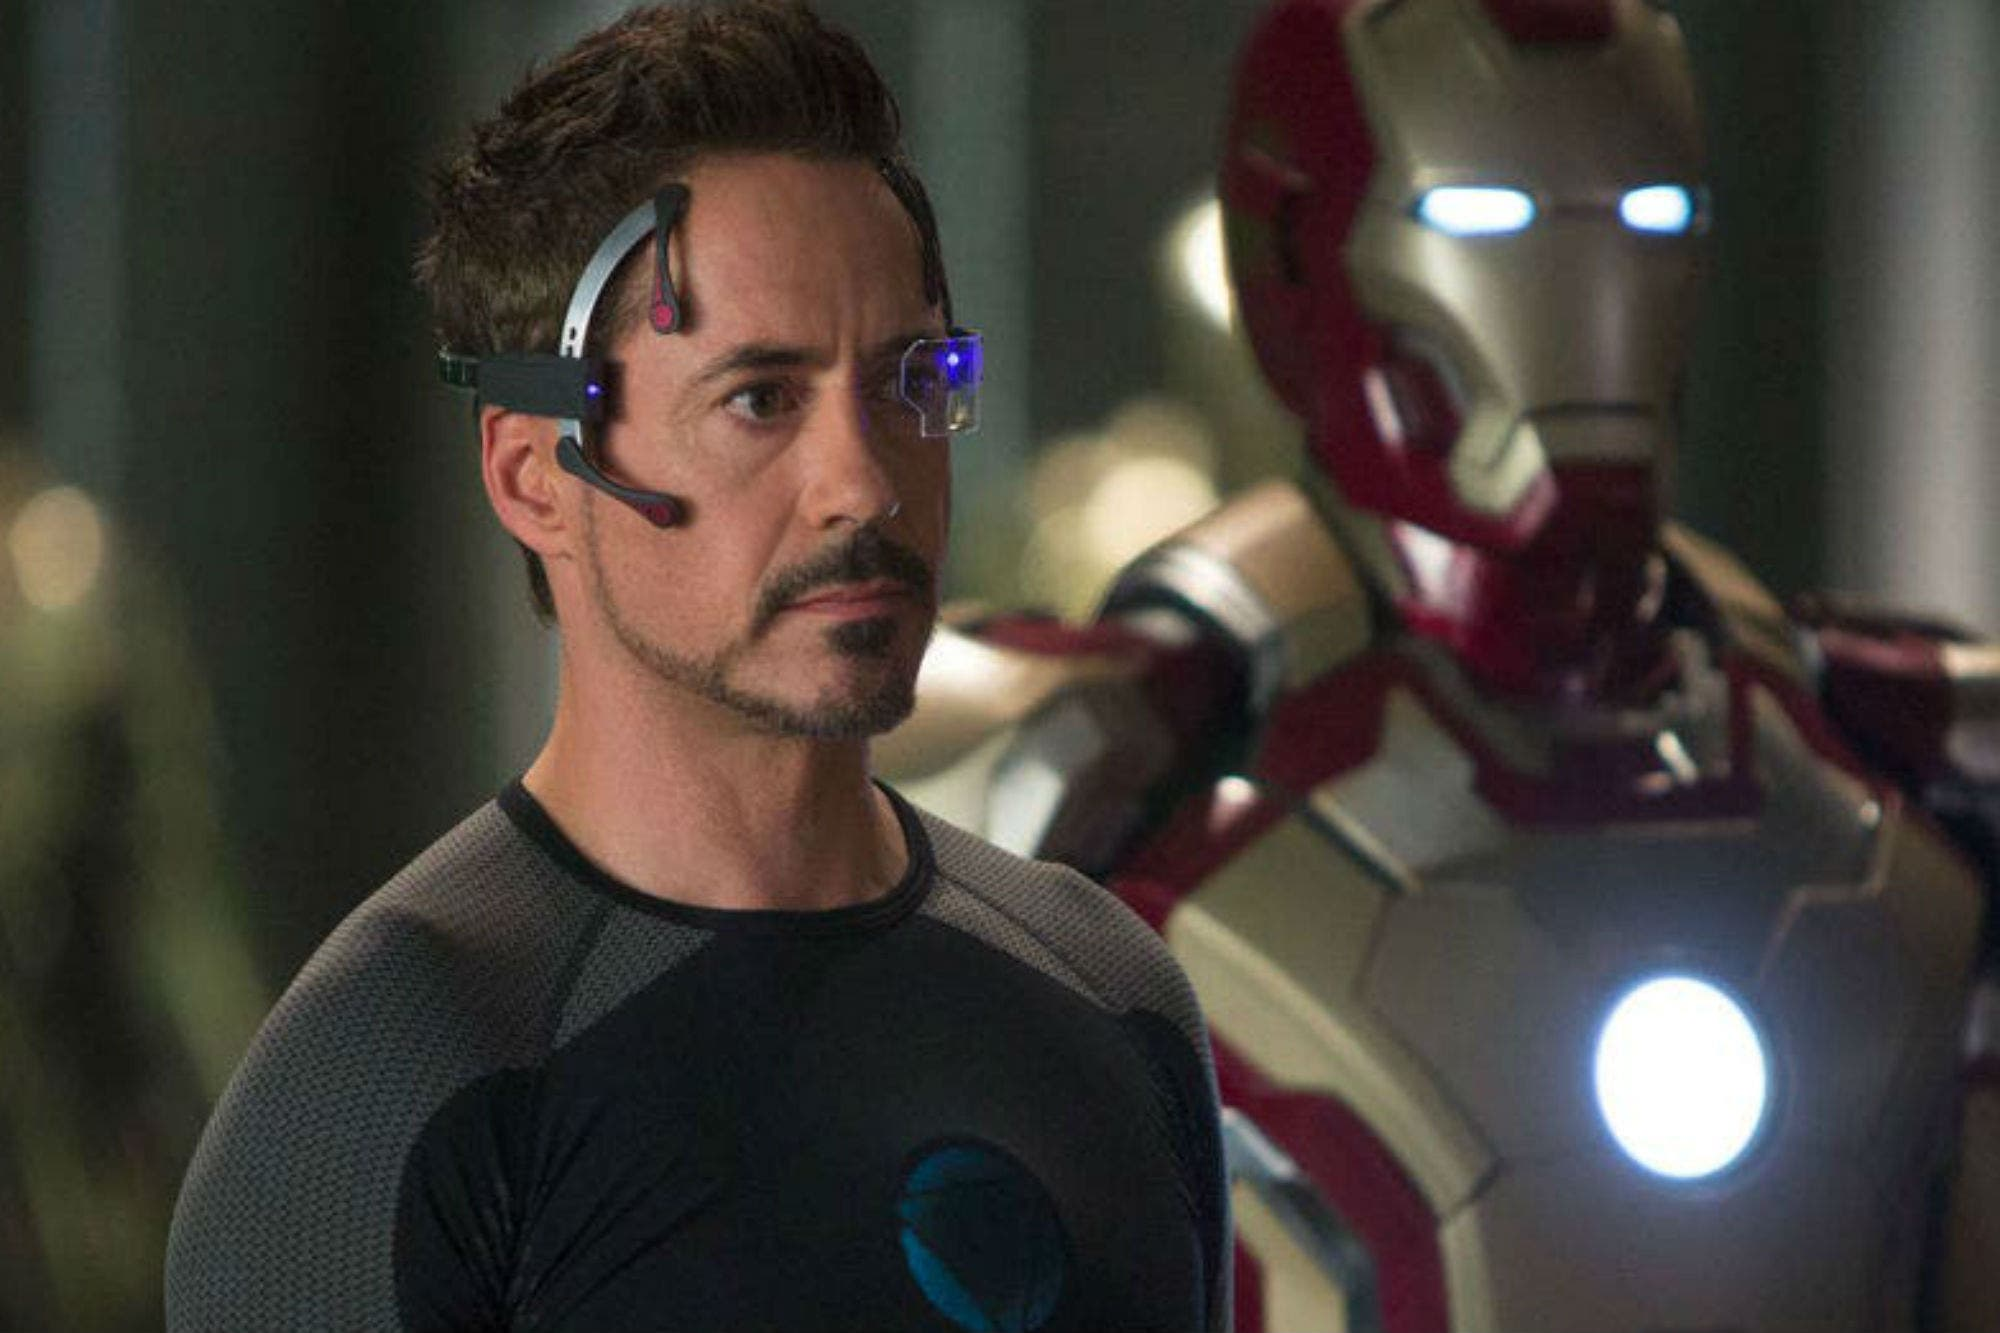 Robert Downey Jr. pidió que no lo nominen al Oscar por Avengers: Endgame